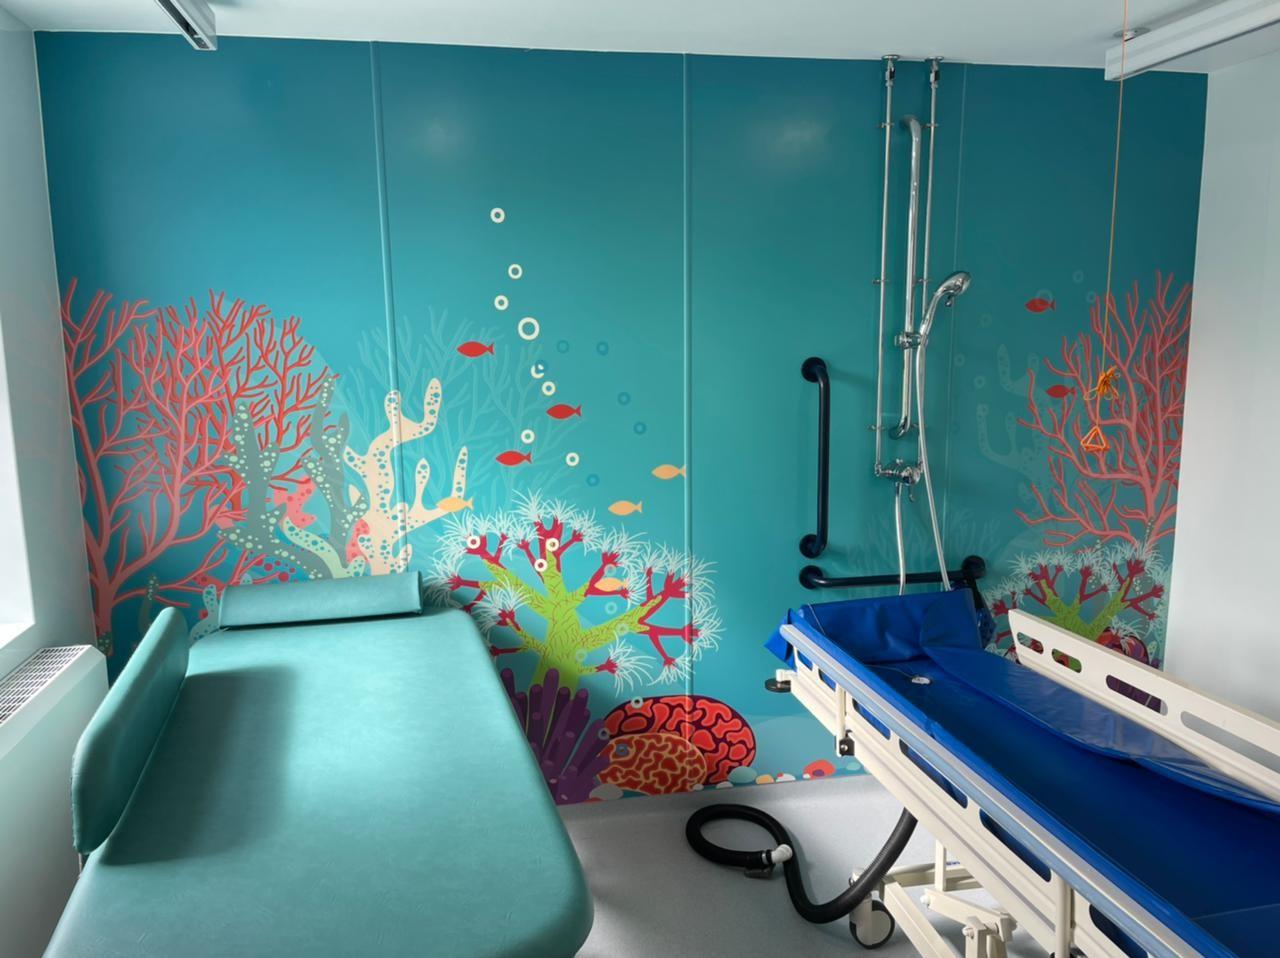 Rebecca House Children's Hospice  – Isle of Man